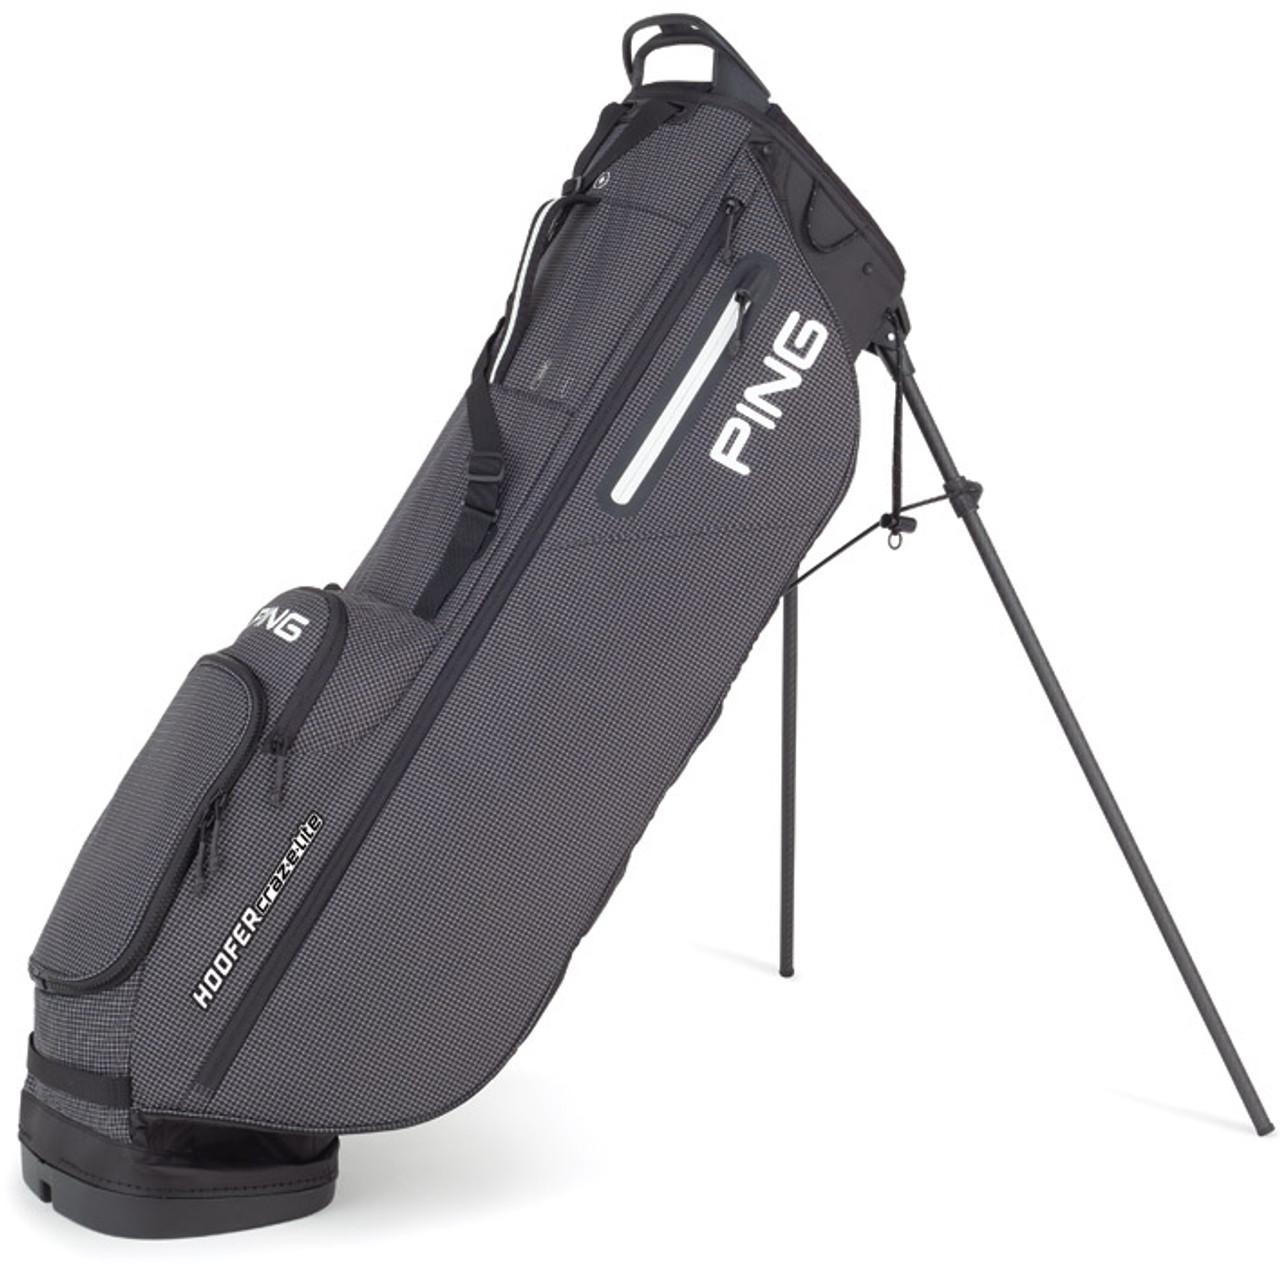 PING Hoofer Craz-E Lite Stand Bag - Black / White